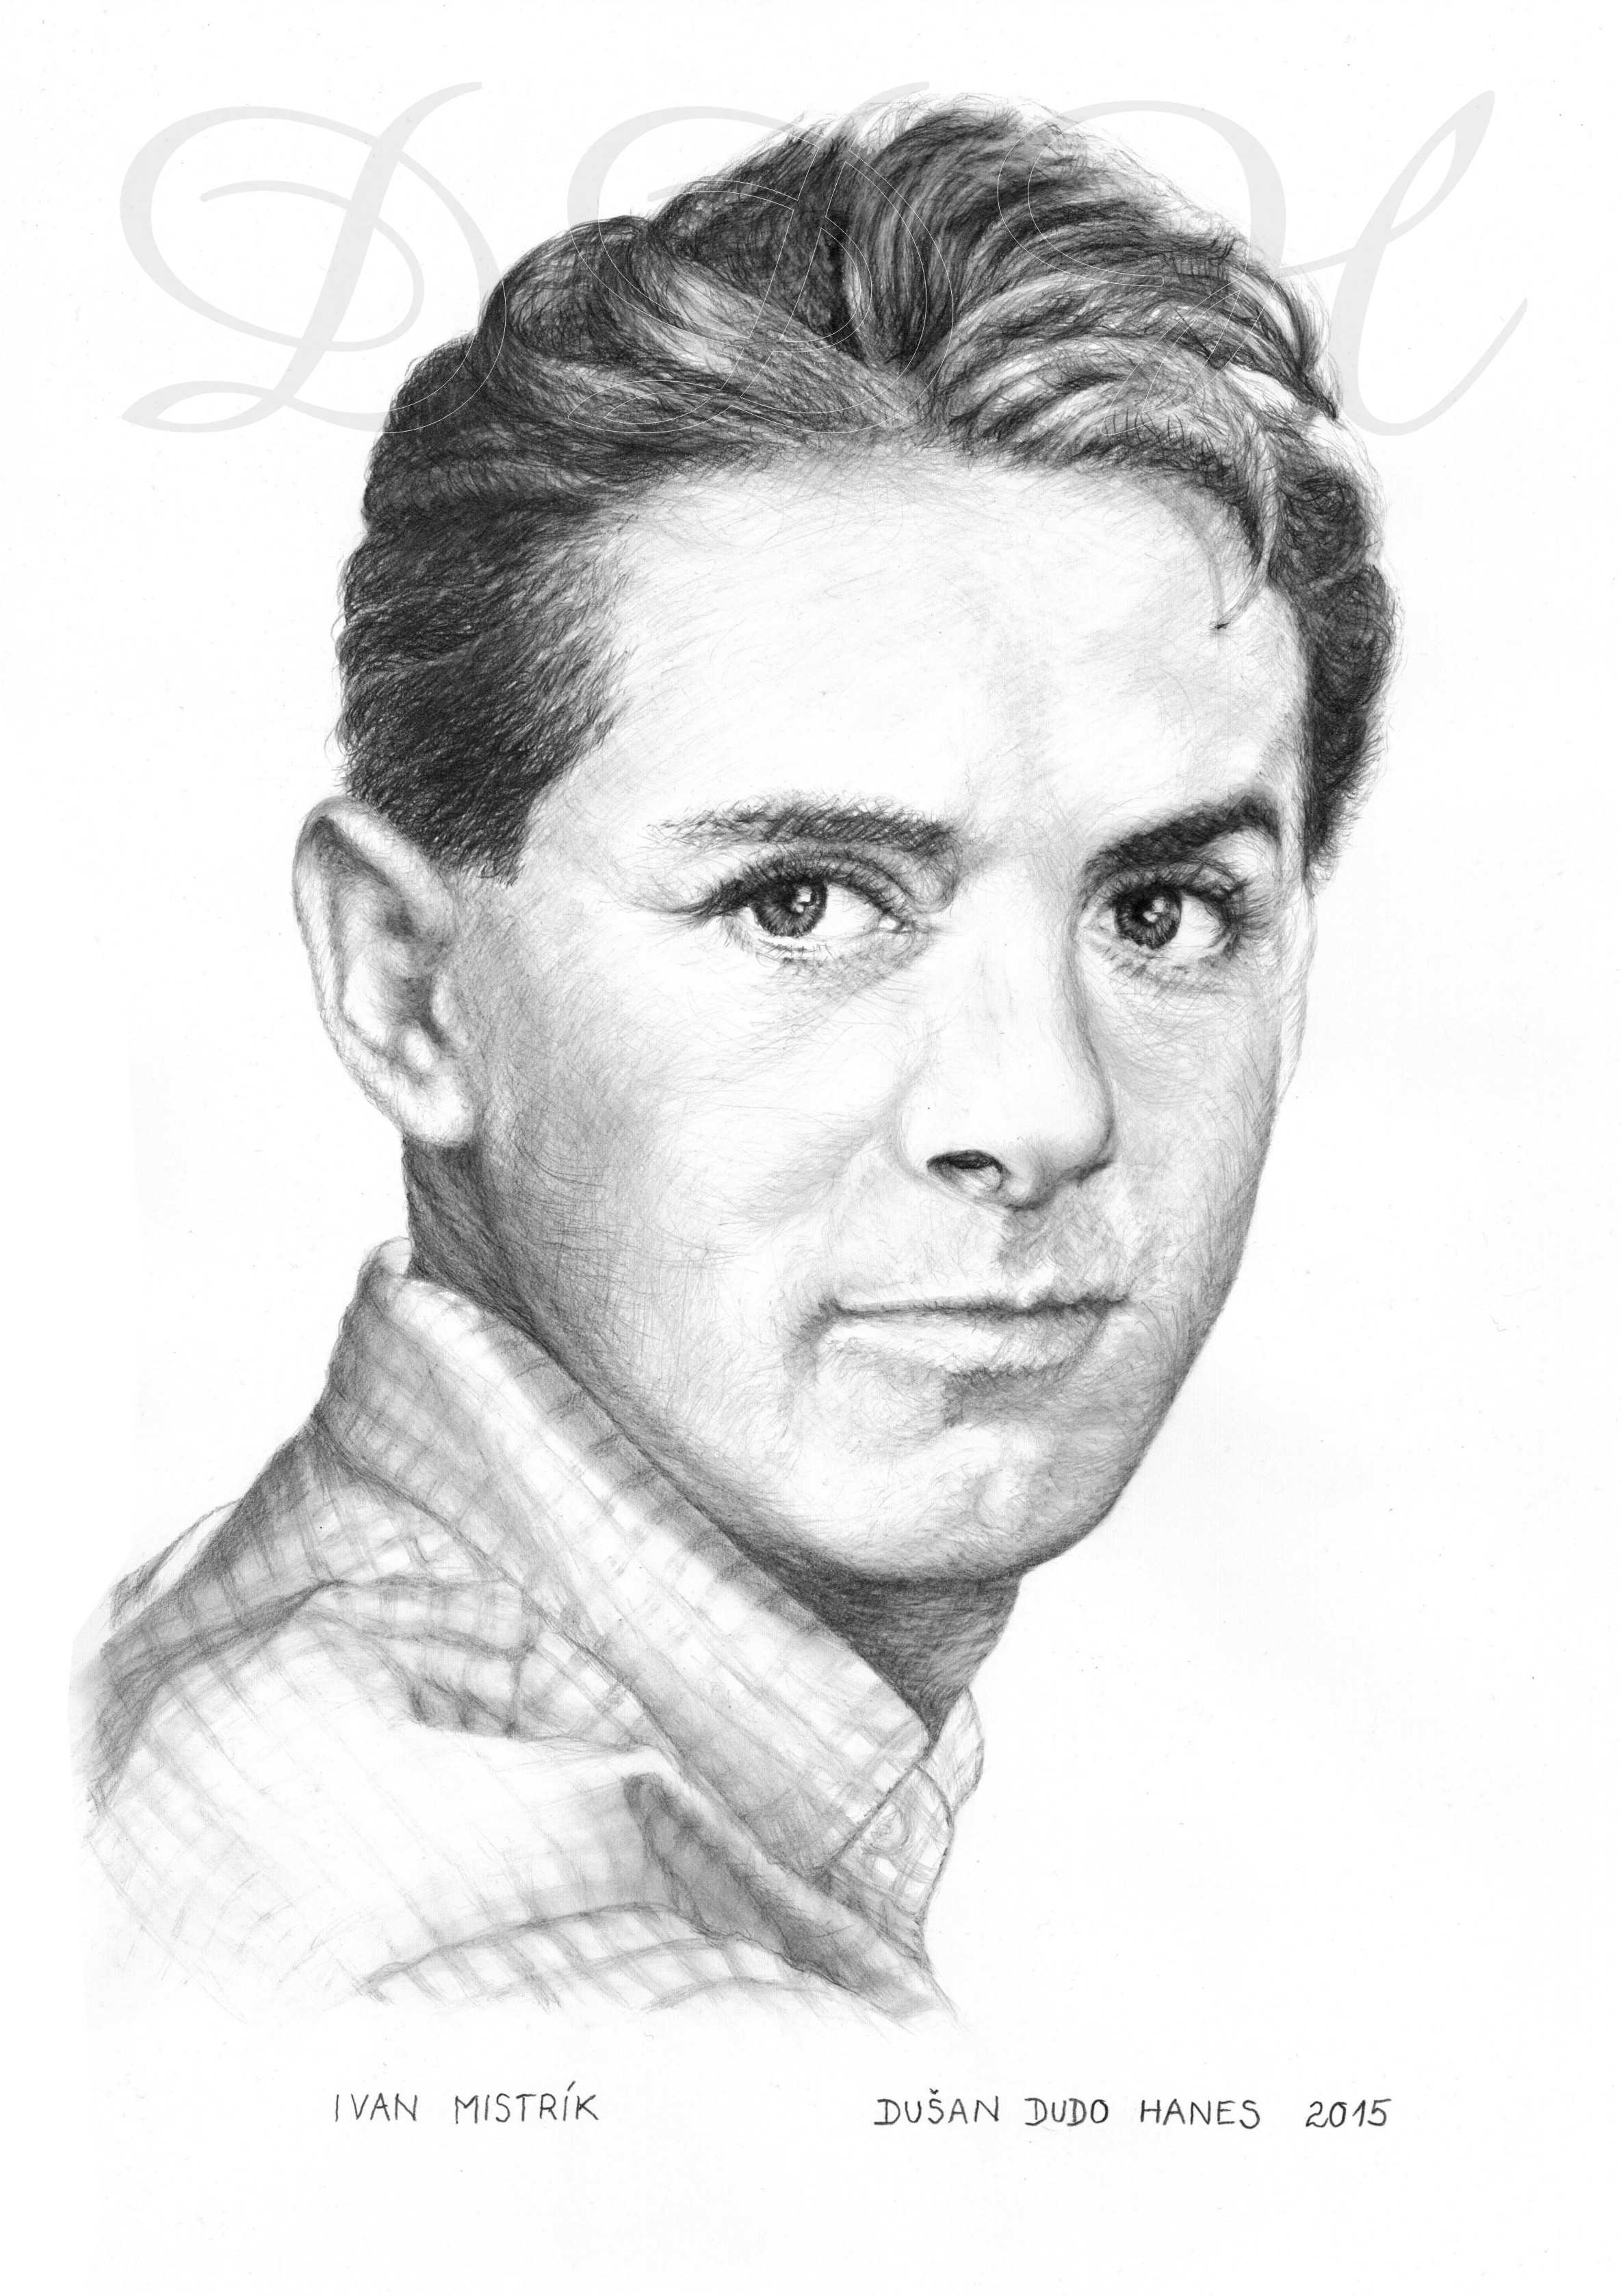 127 - Ivan Mistrík, portrét Dušan Dudo Hanes